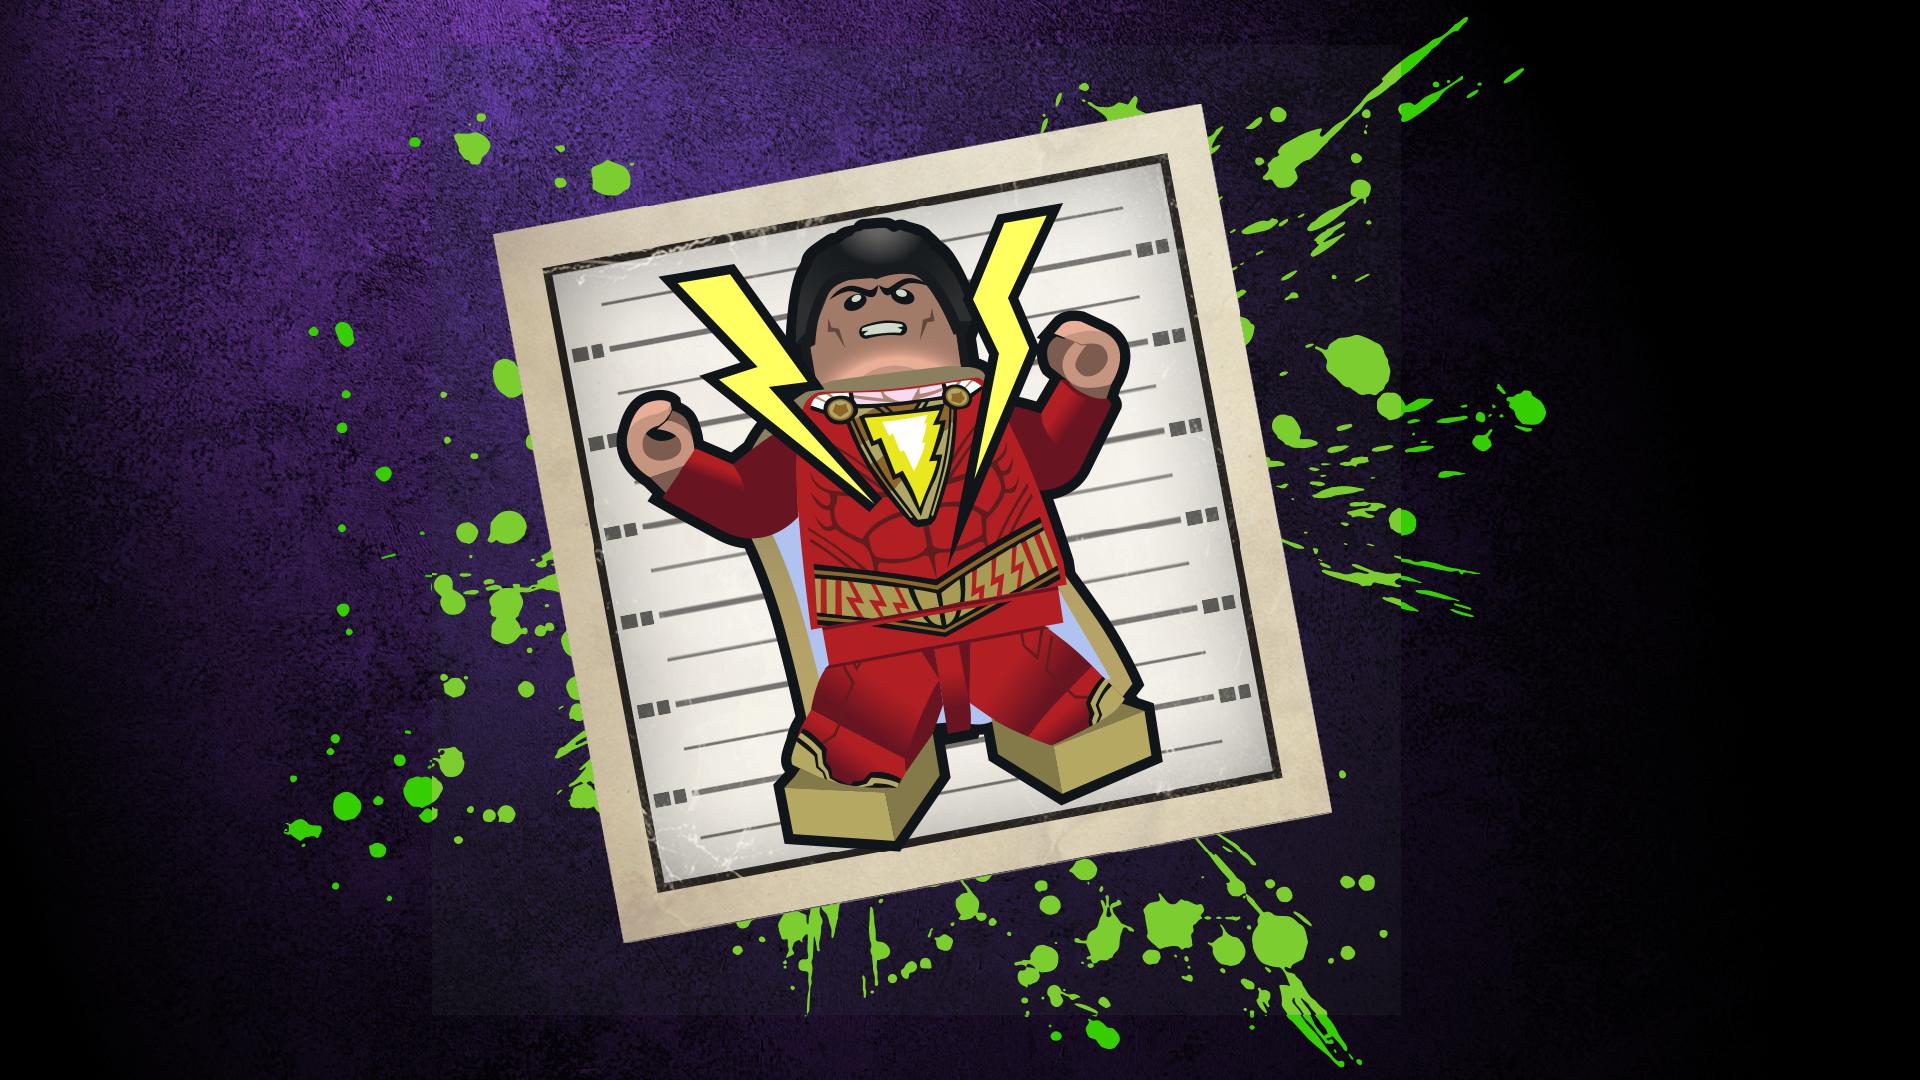 Icon for His name's Captain Sparklefingers